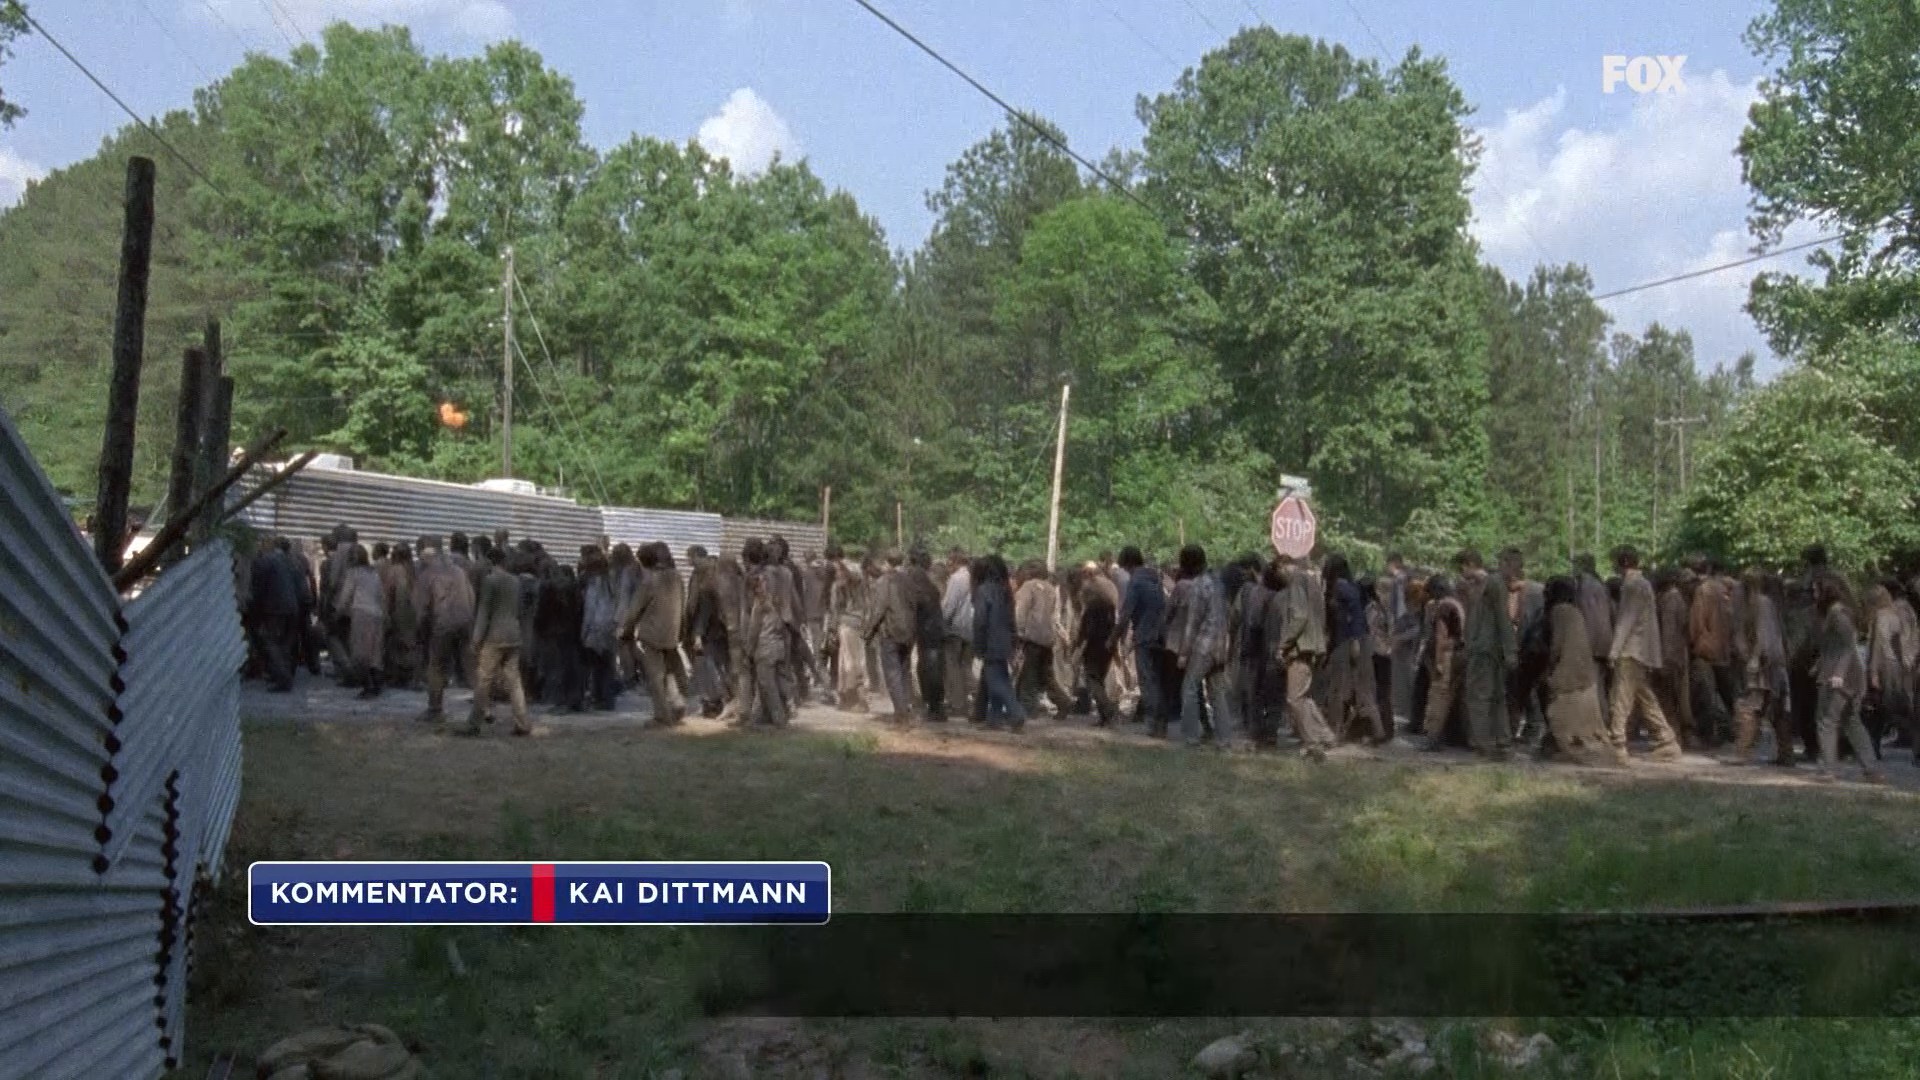 Thumbnail for FOX – The Walking Dead Mid-Season Break Campaign